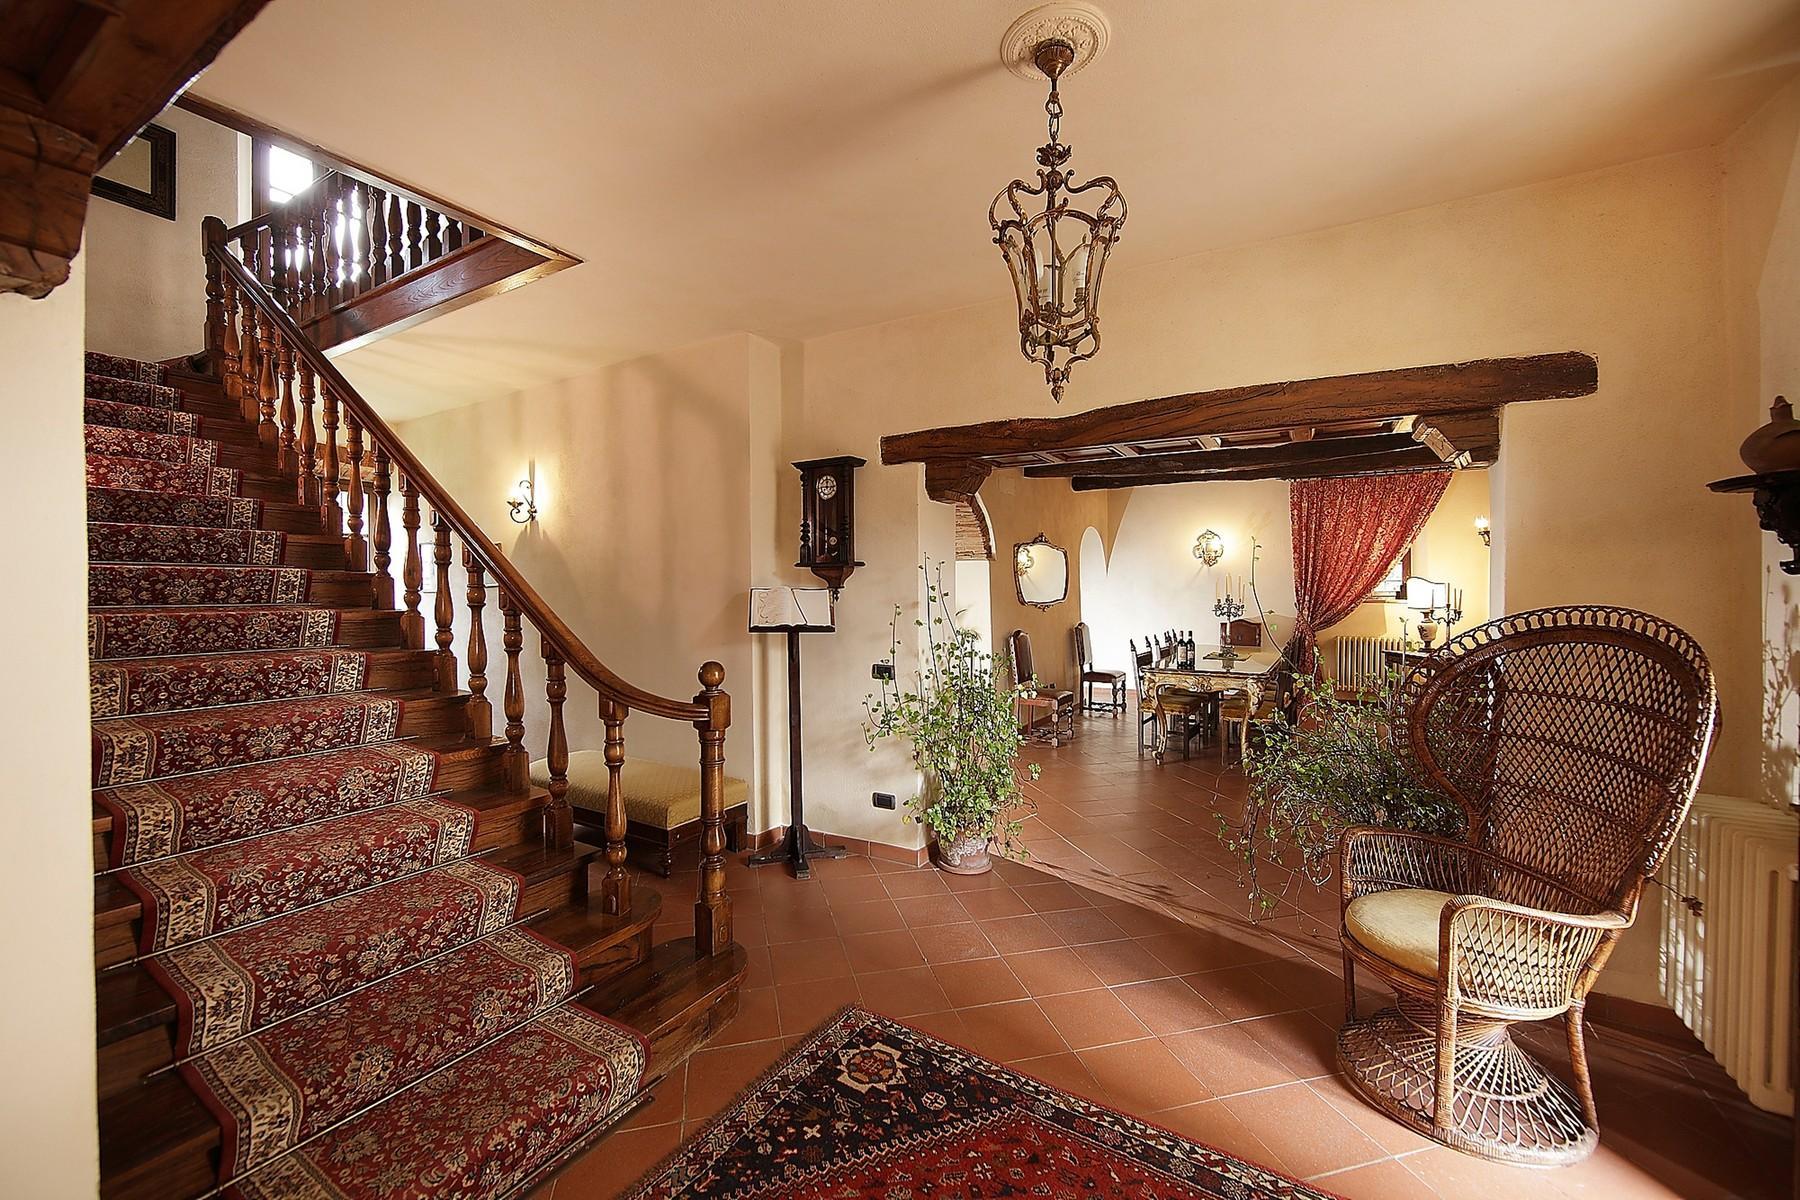 Exclusive manor in the heart of Chianti Classico - 10